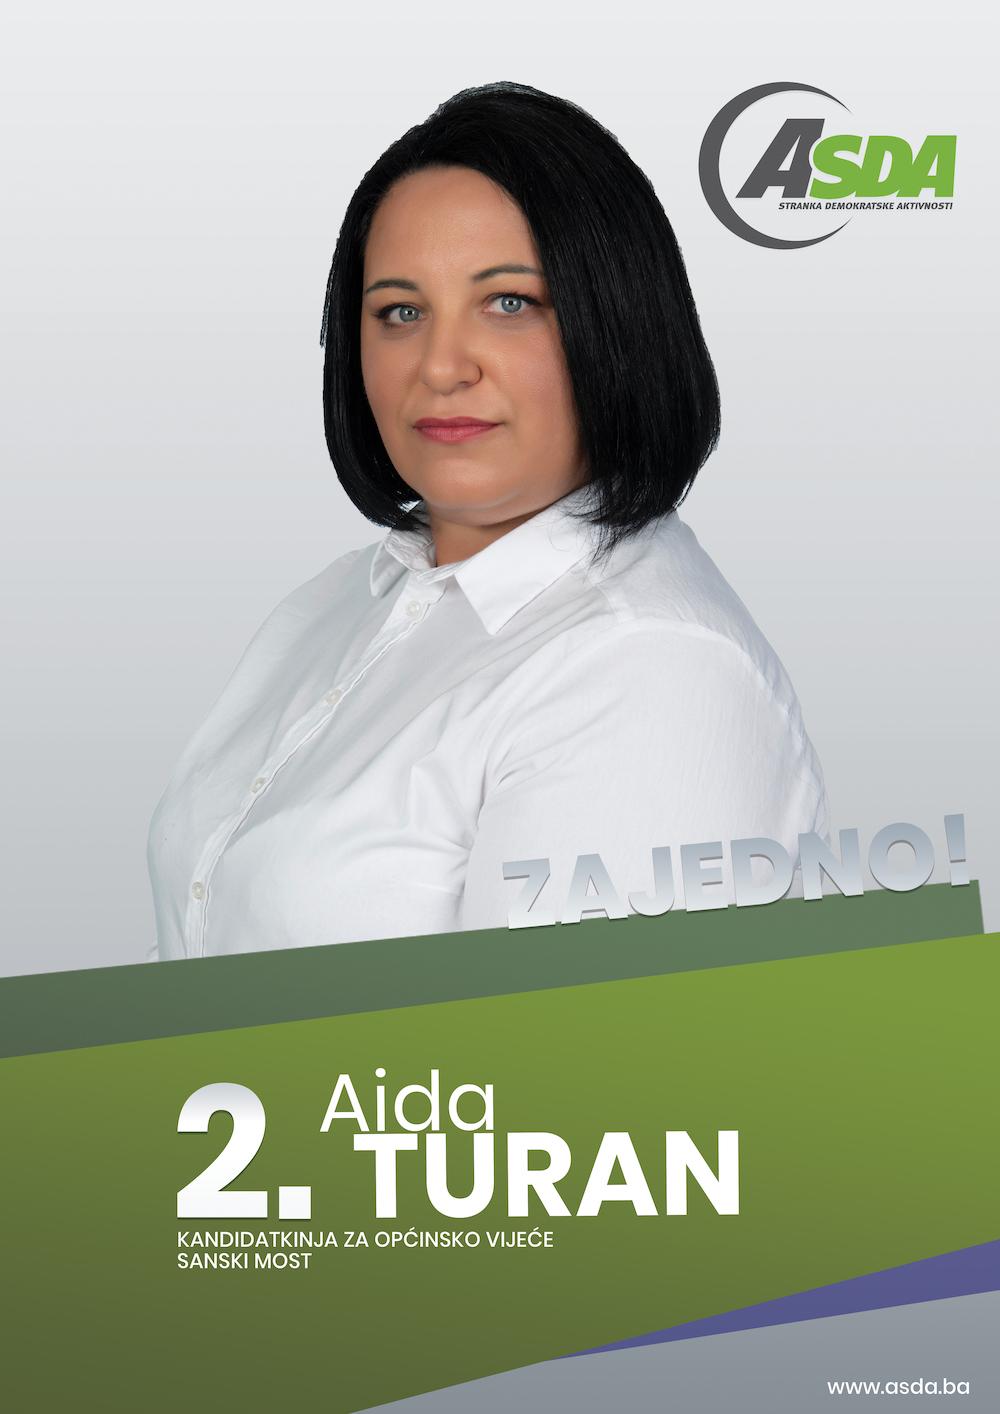 Aida Turan